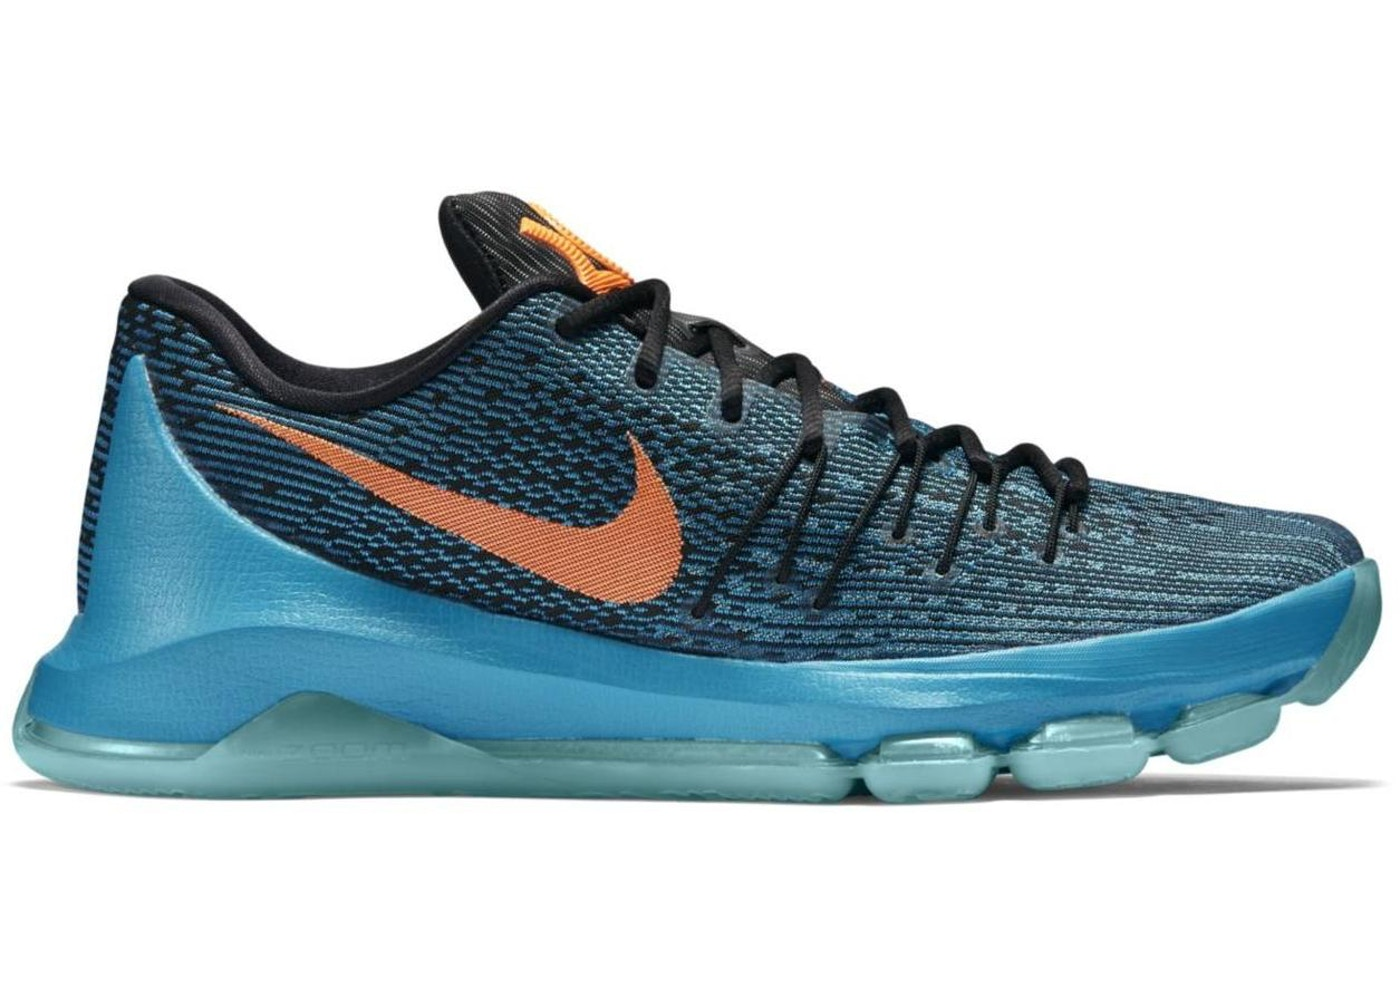 3fe158100cf Nike KD 8 Shoes - Average Sale Price